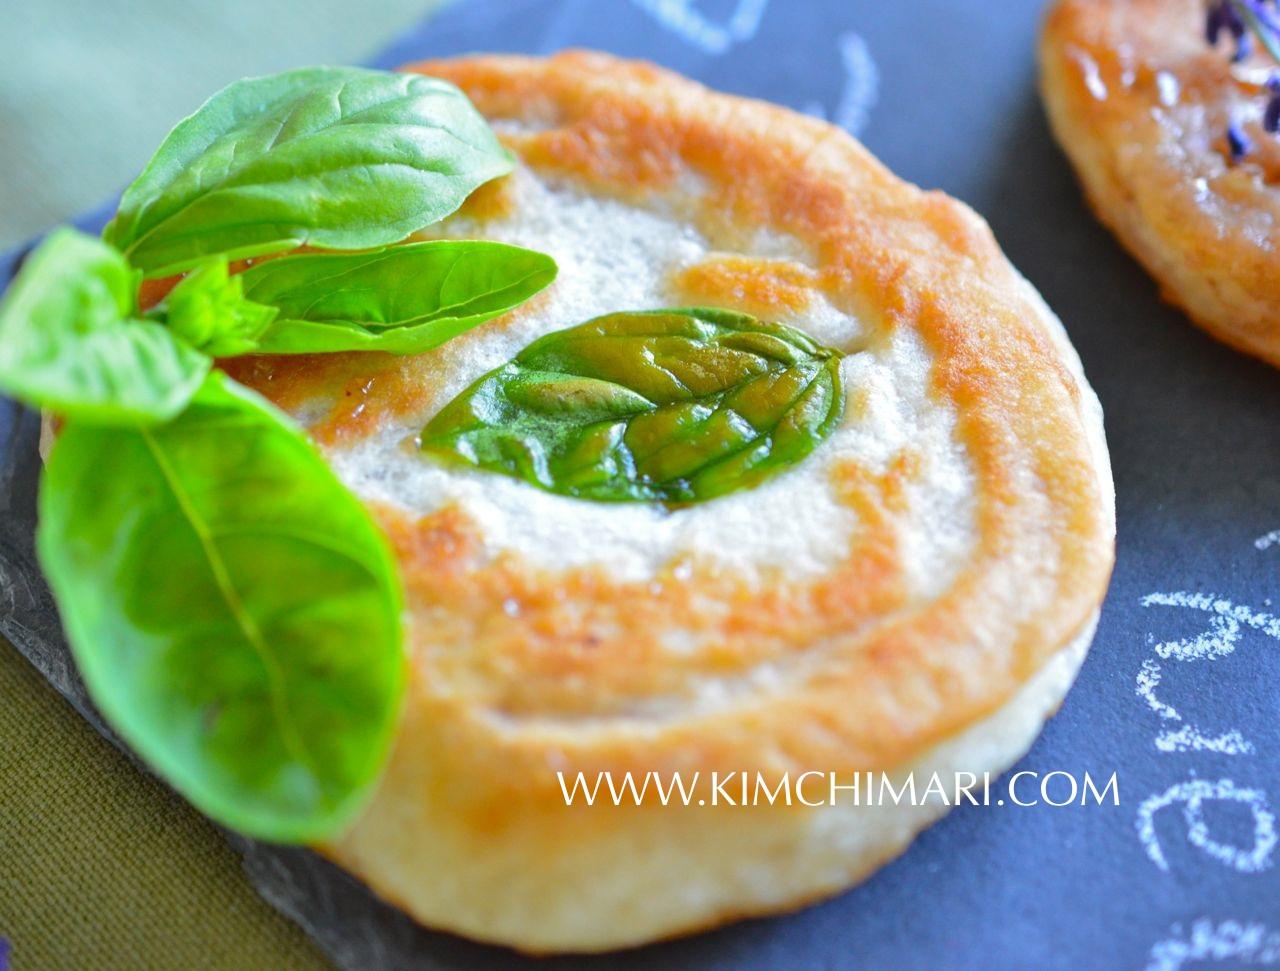 Basil Hotteok/Hoddeok (Korean sweet dessert pancake) www.kimchimari.com